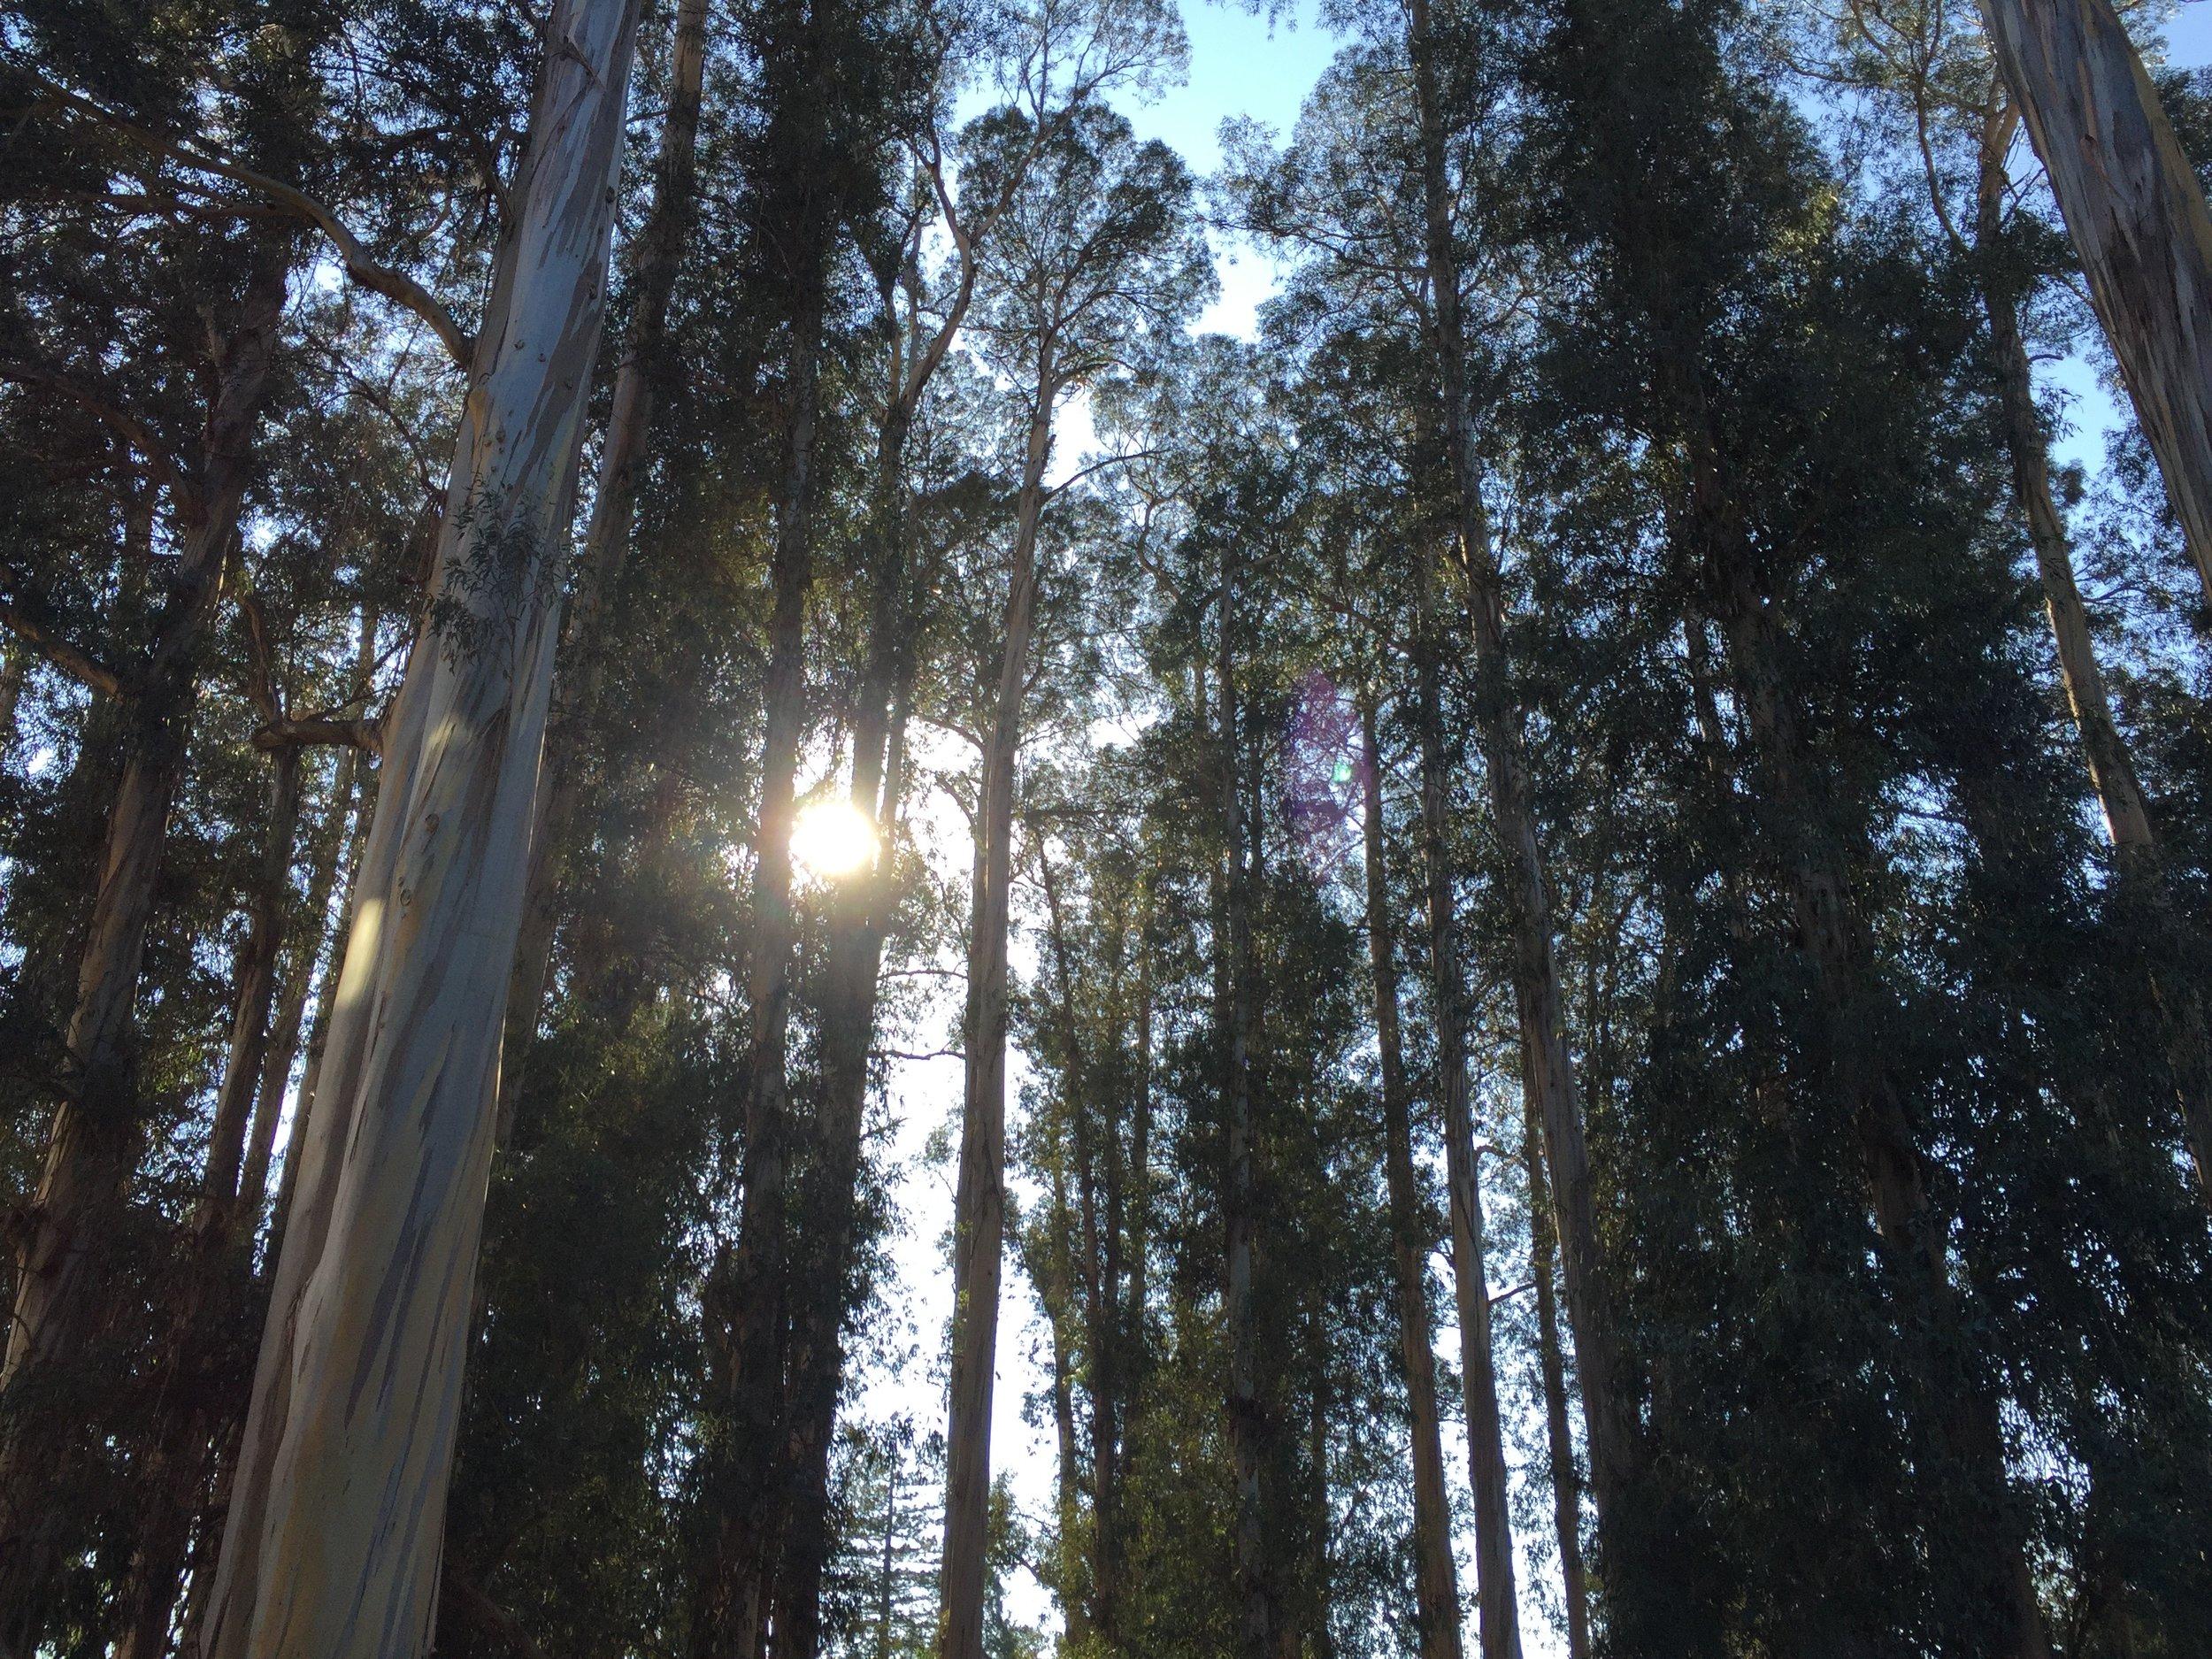 UC Berkeley campus, Strawberry Canyon, eucalyptus grove